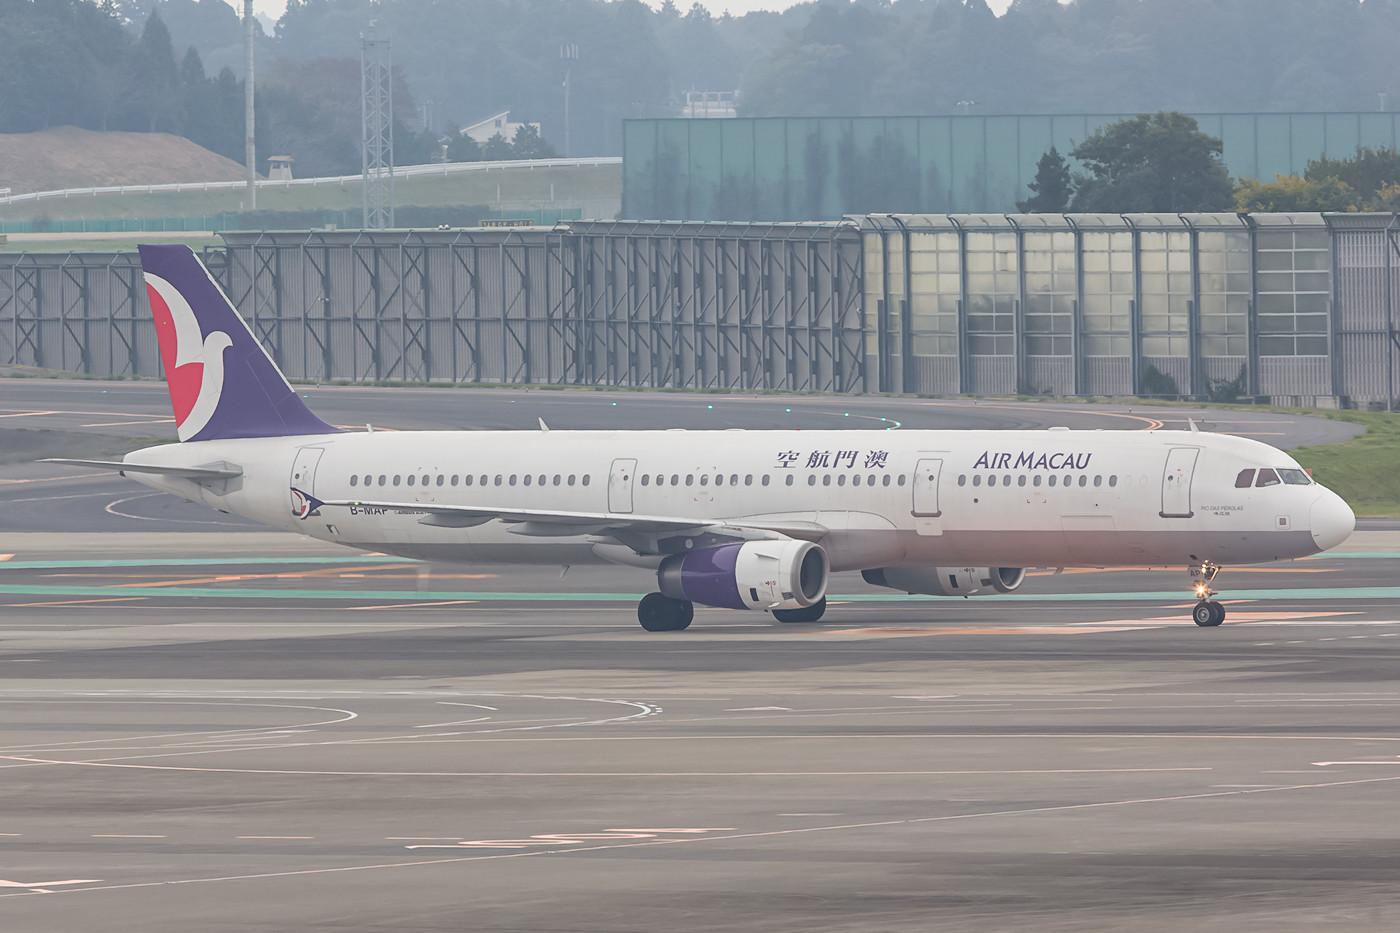 Das Spielerparadies Macau hat Las Vegas längst überholt. Air Macau fliegt einmal am Tag in die ehemalige portugiesische Kolonie.